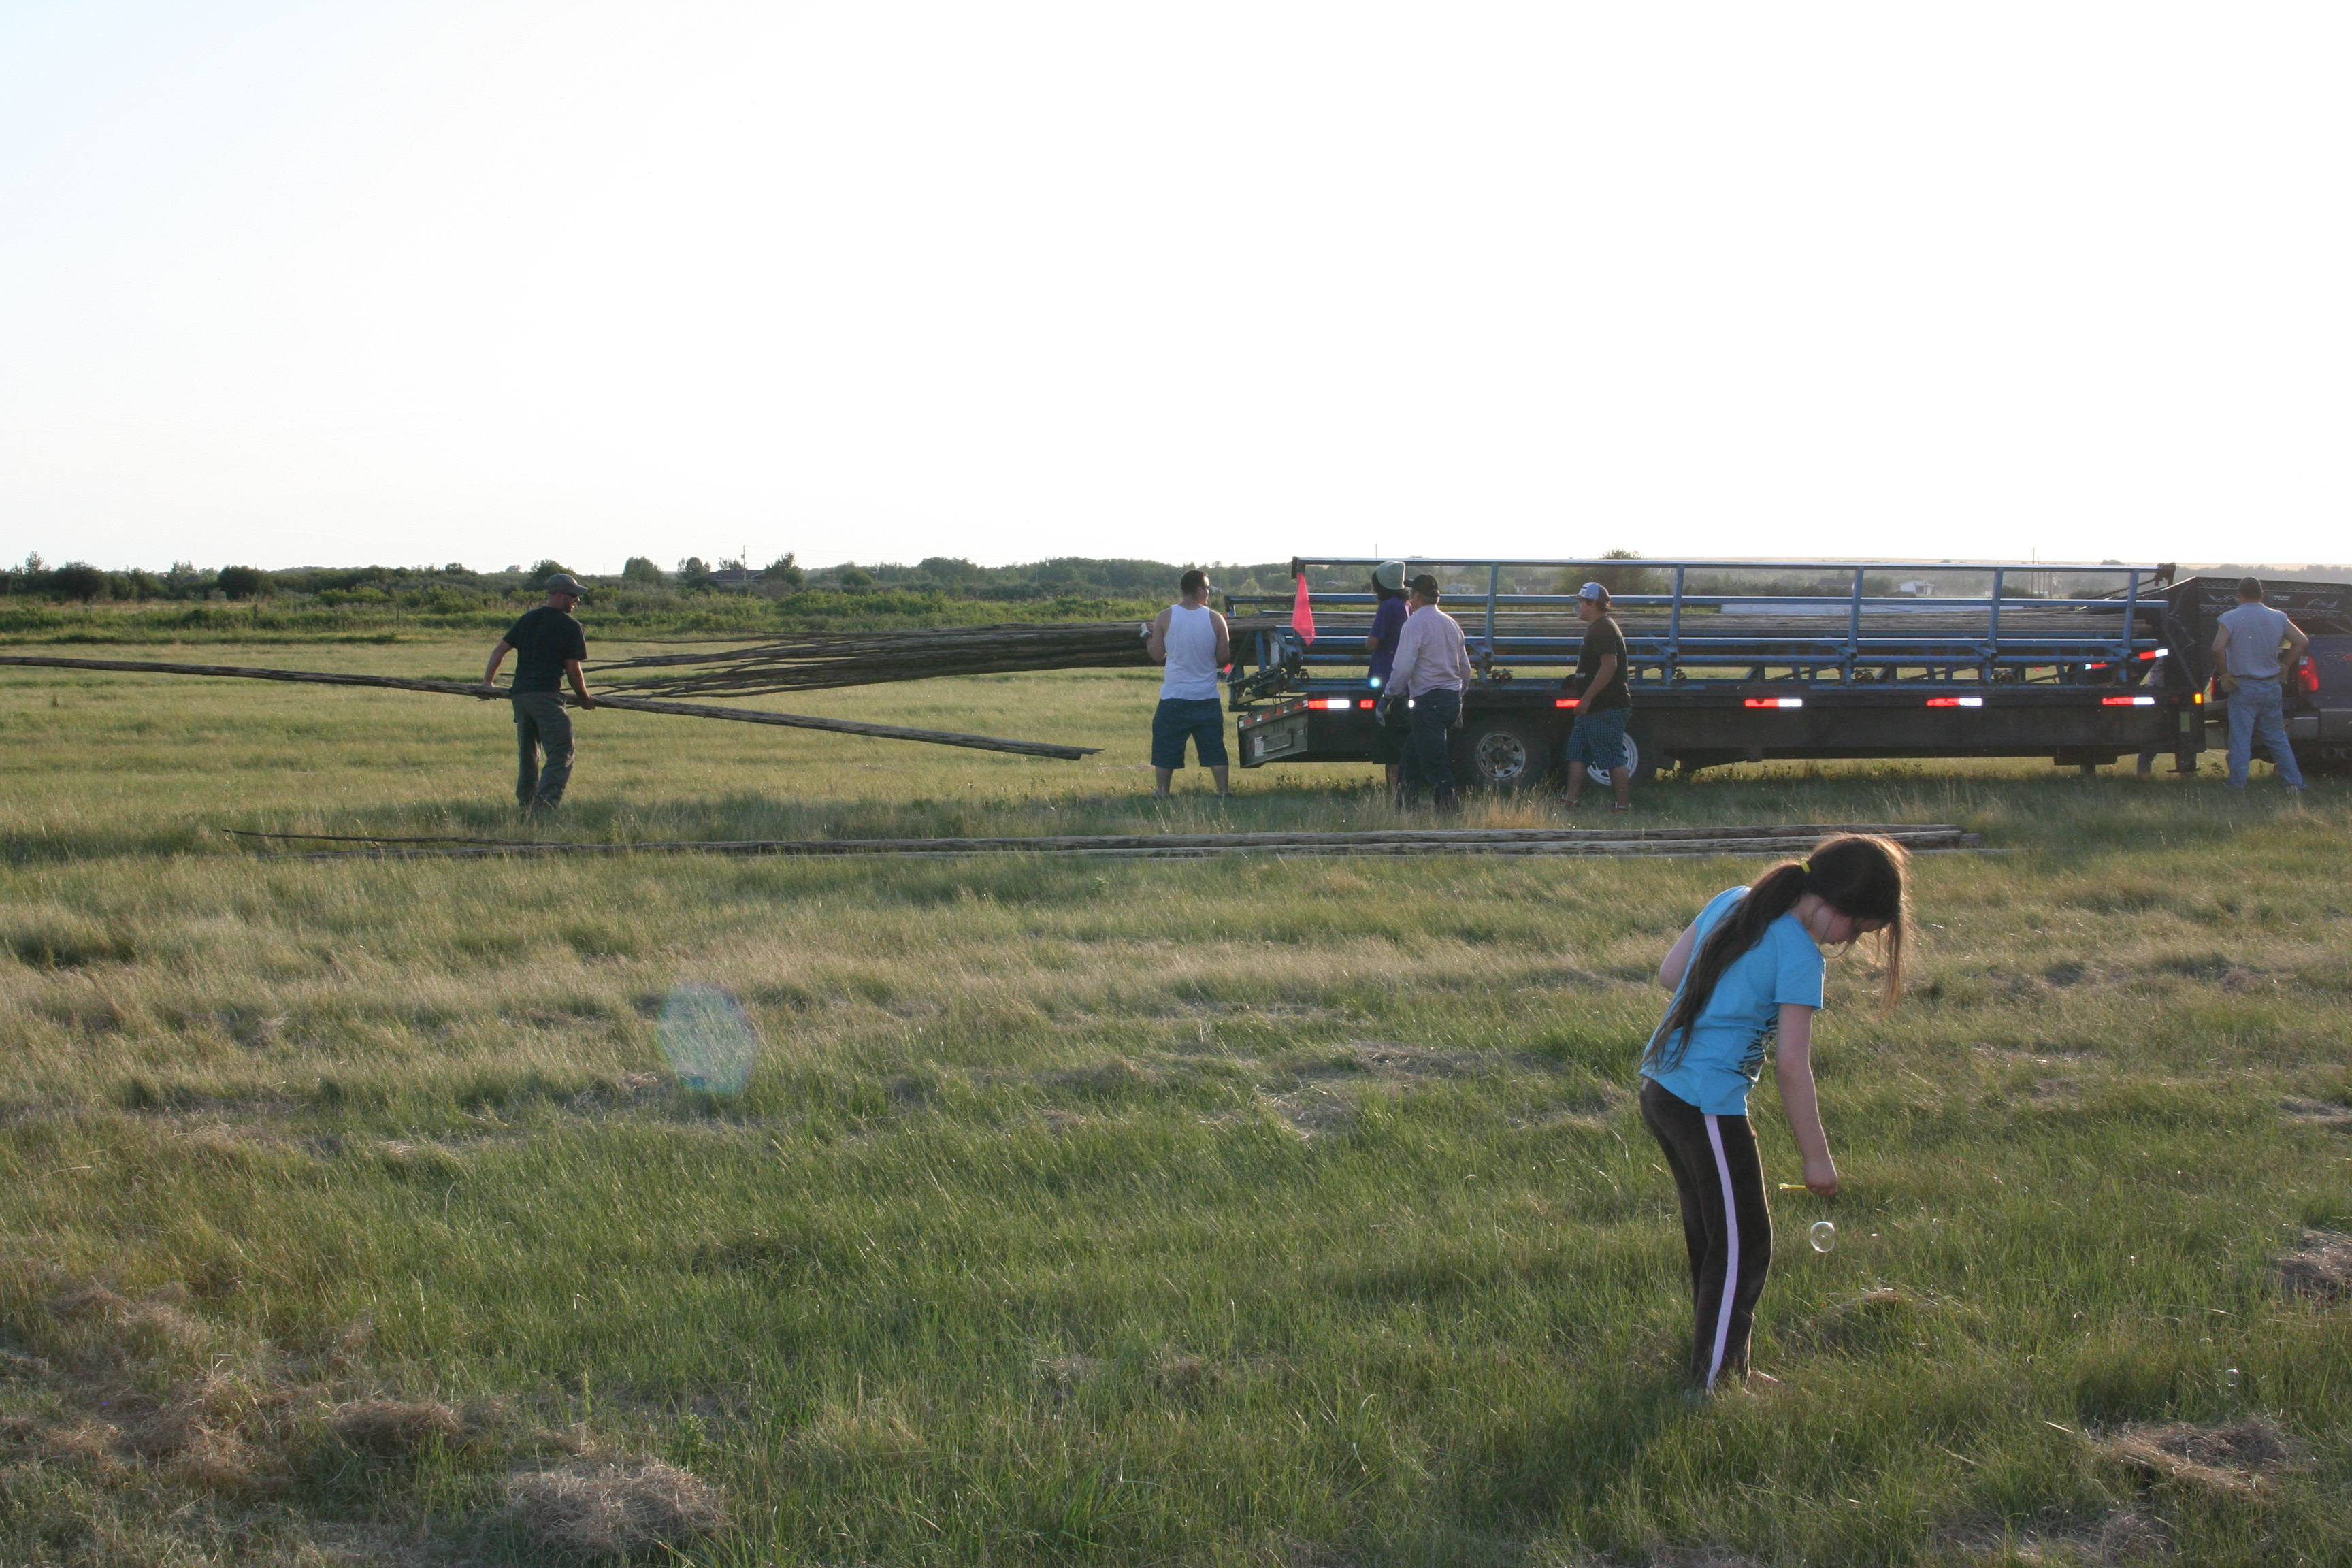 Kevin unloads a pole